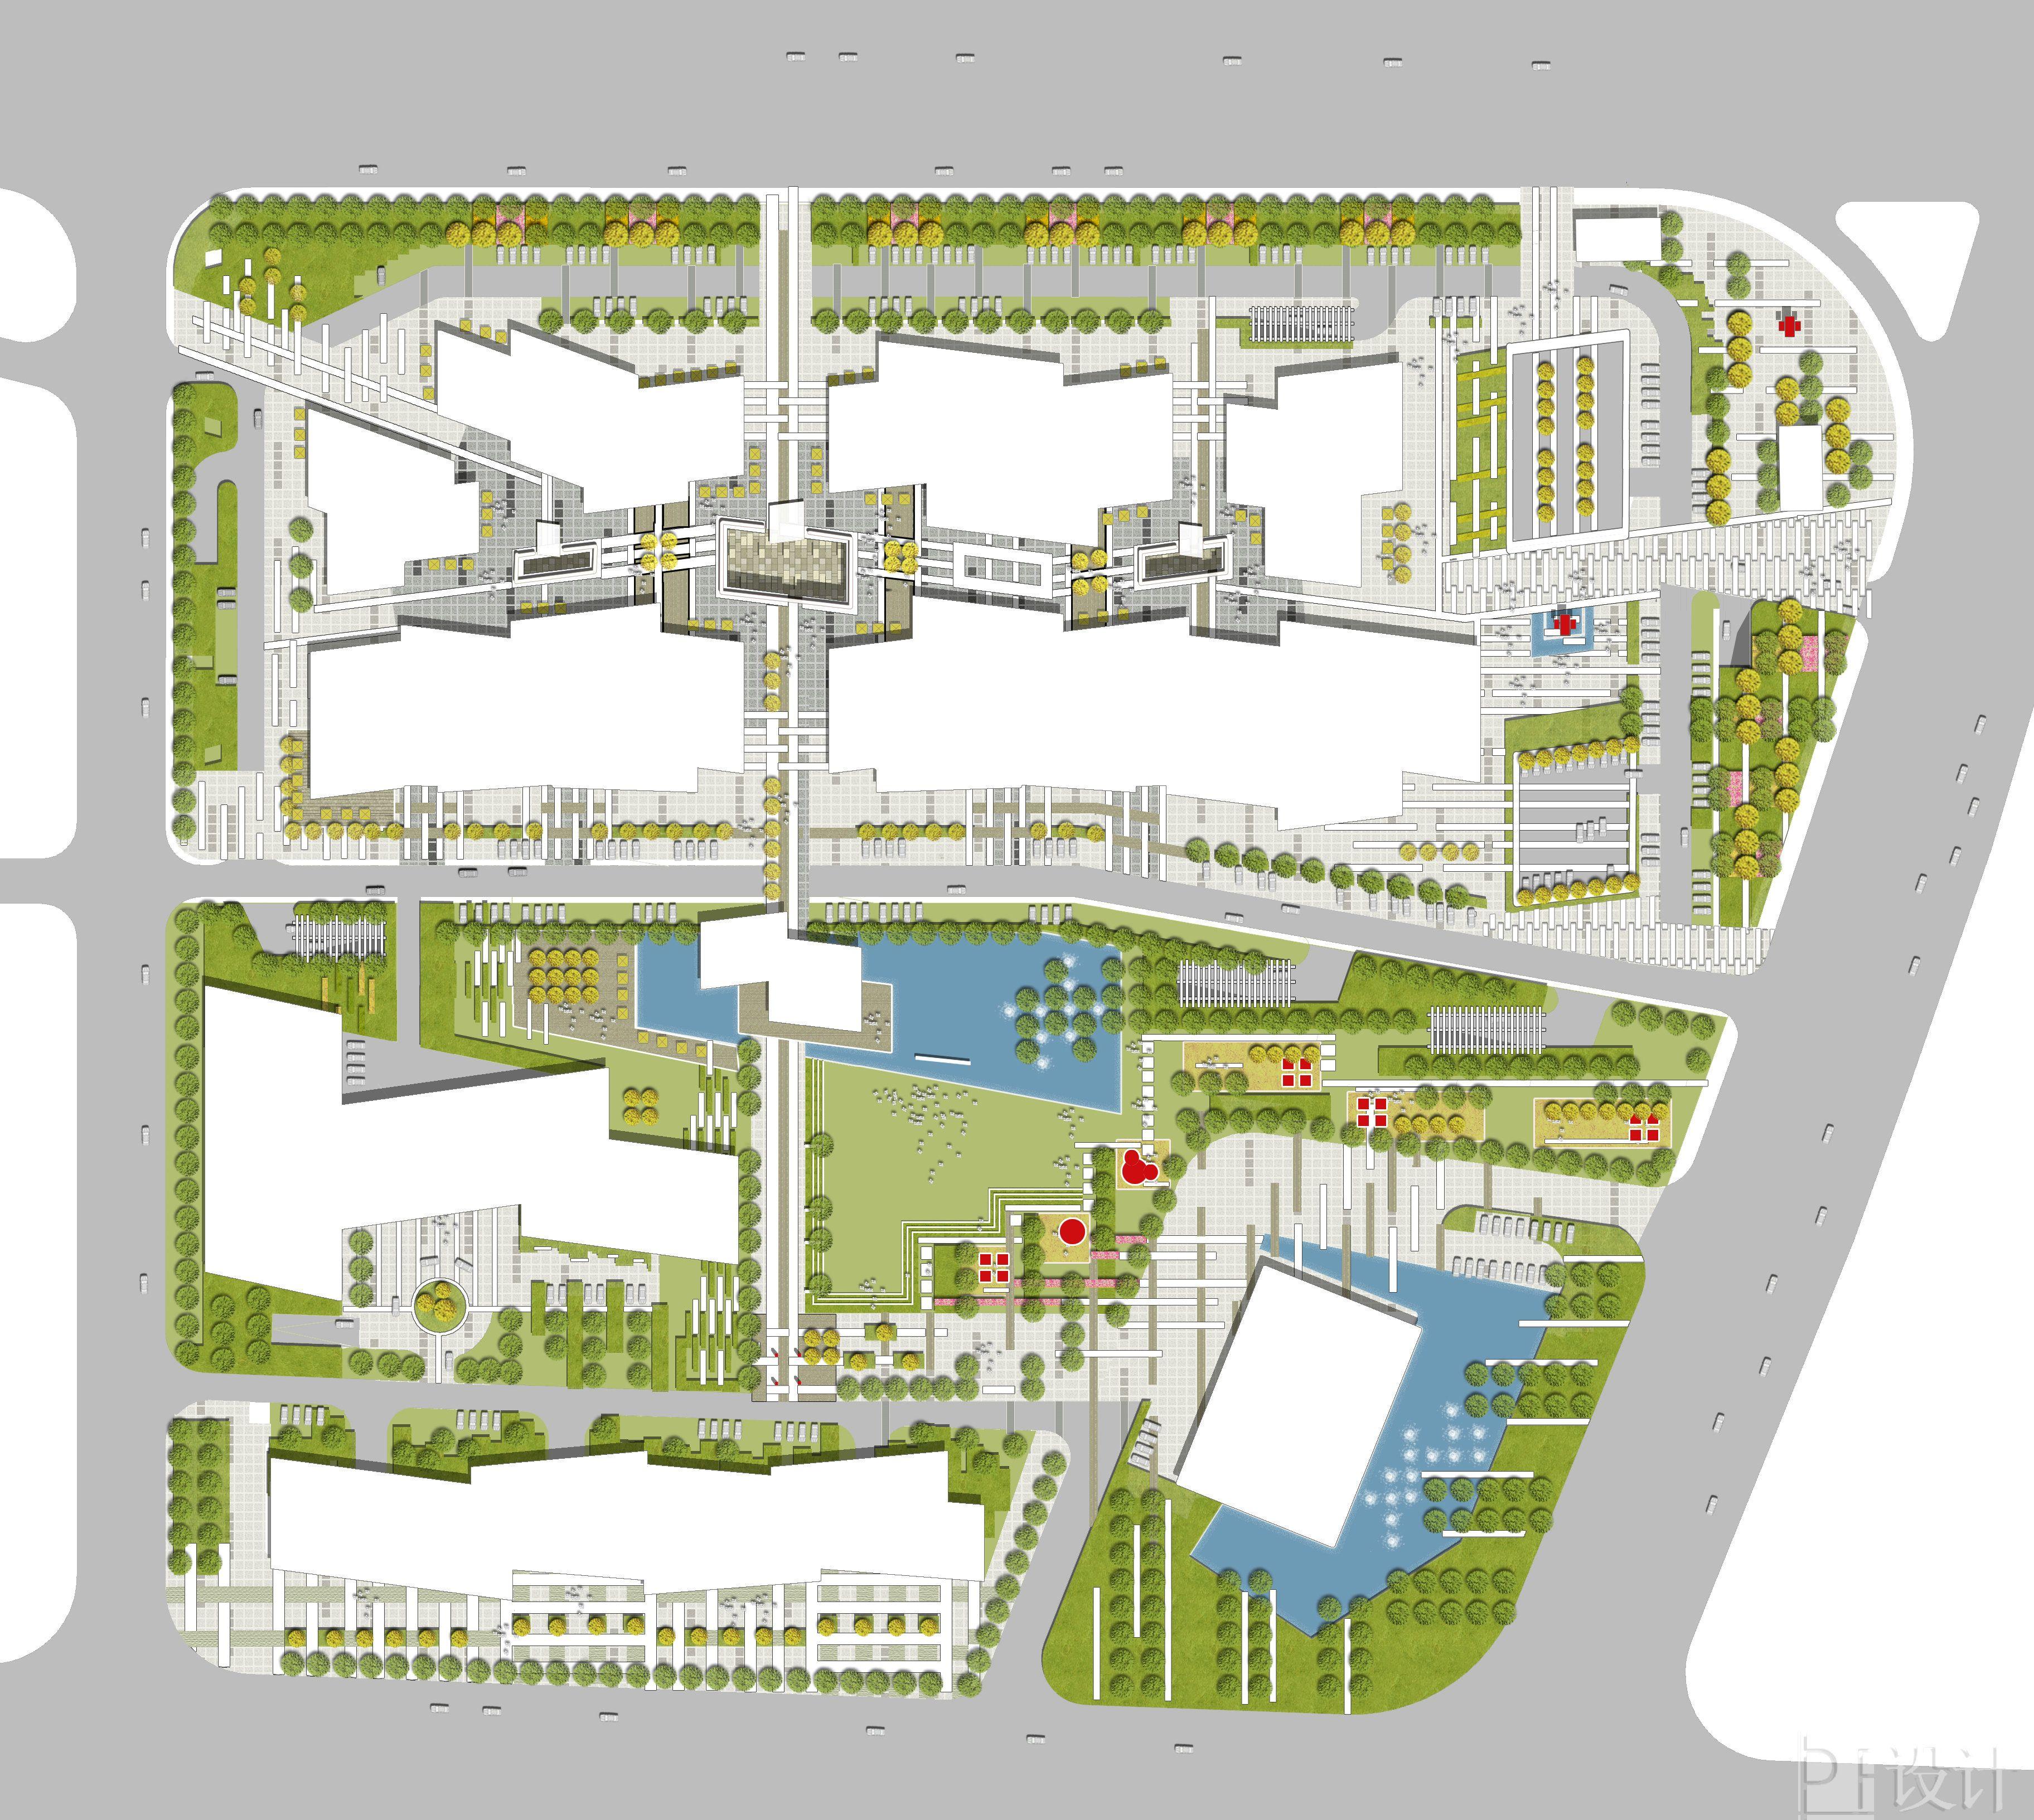 Top 100 Amazing Landscape Layout Ideas V.2 | Download CAD Blocks,Drawings,.  Landscape DesignGarden ...